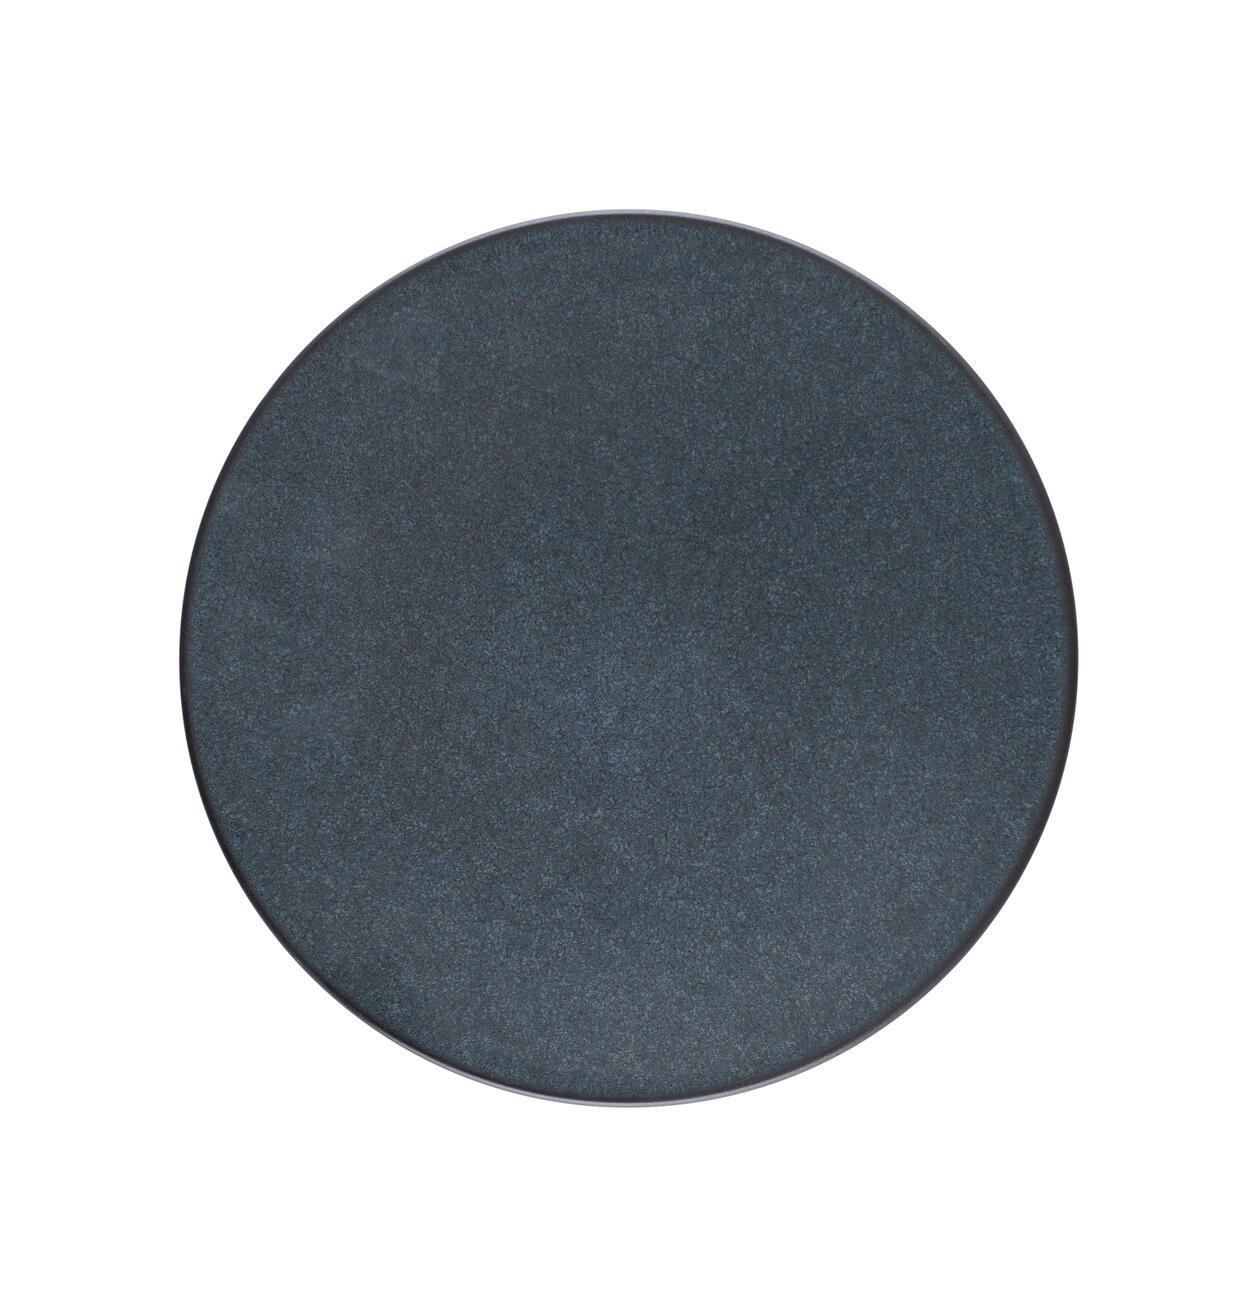 Dinner Plate - Tourron - Ink Blue-1